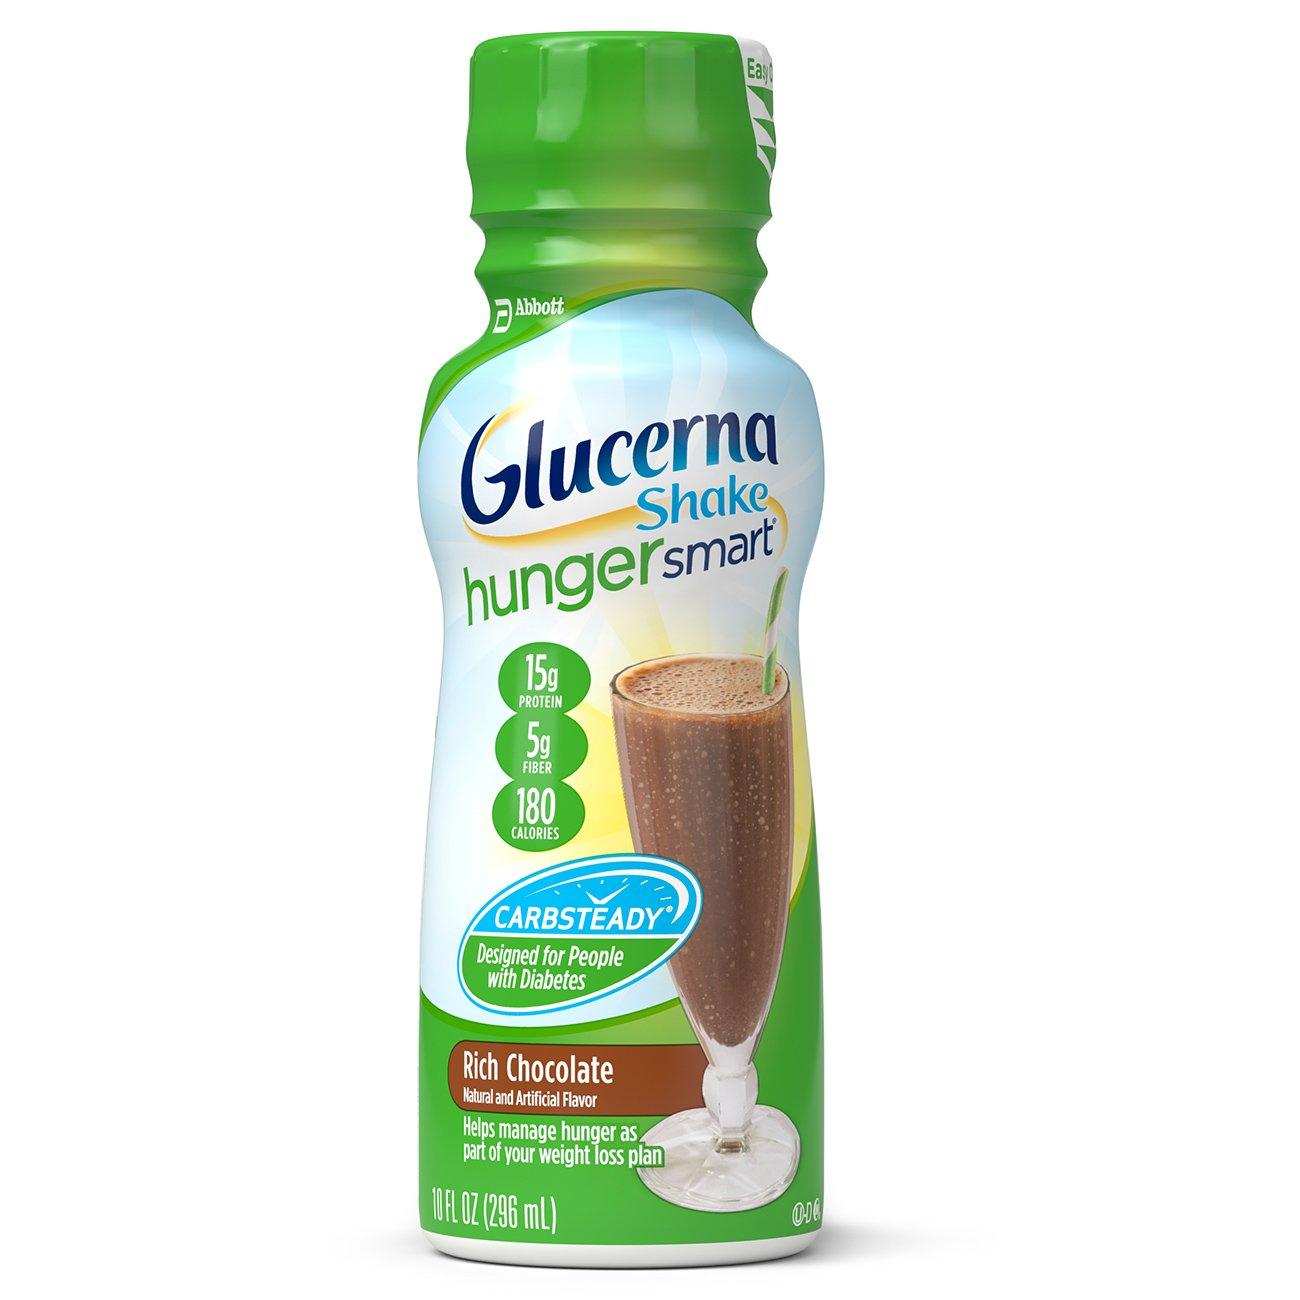 Glucerna Hunger Smart Shake, to Help Manage Blood Sugar, Rich Chocolate, 10 fl oz, 24 Count